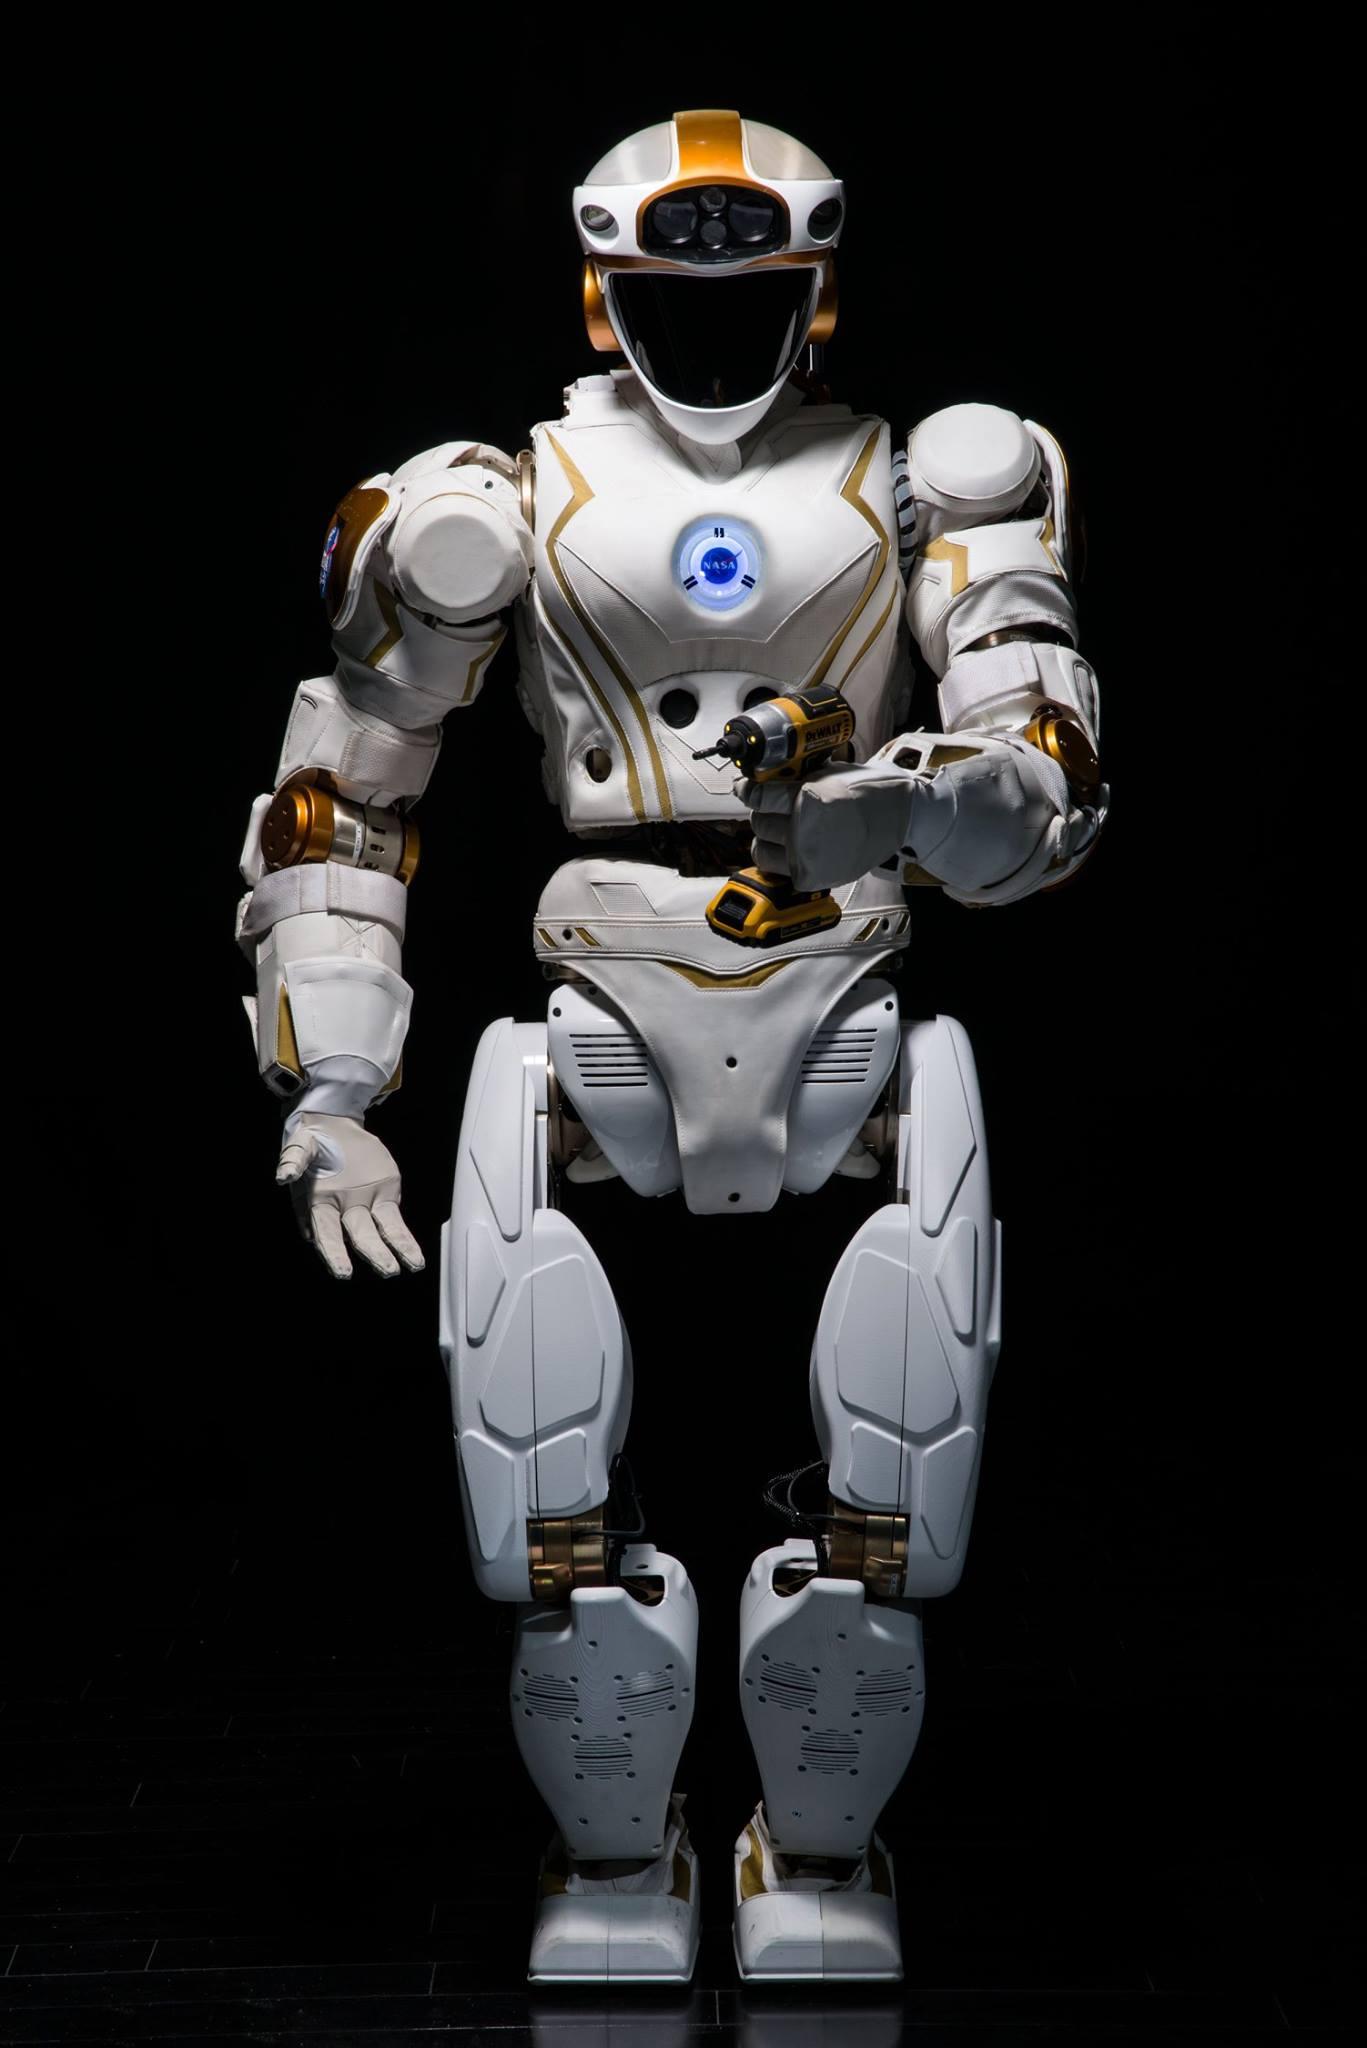 nasa humanoid robot - HD1367×2048